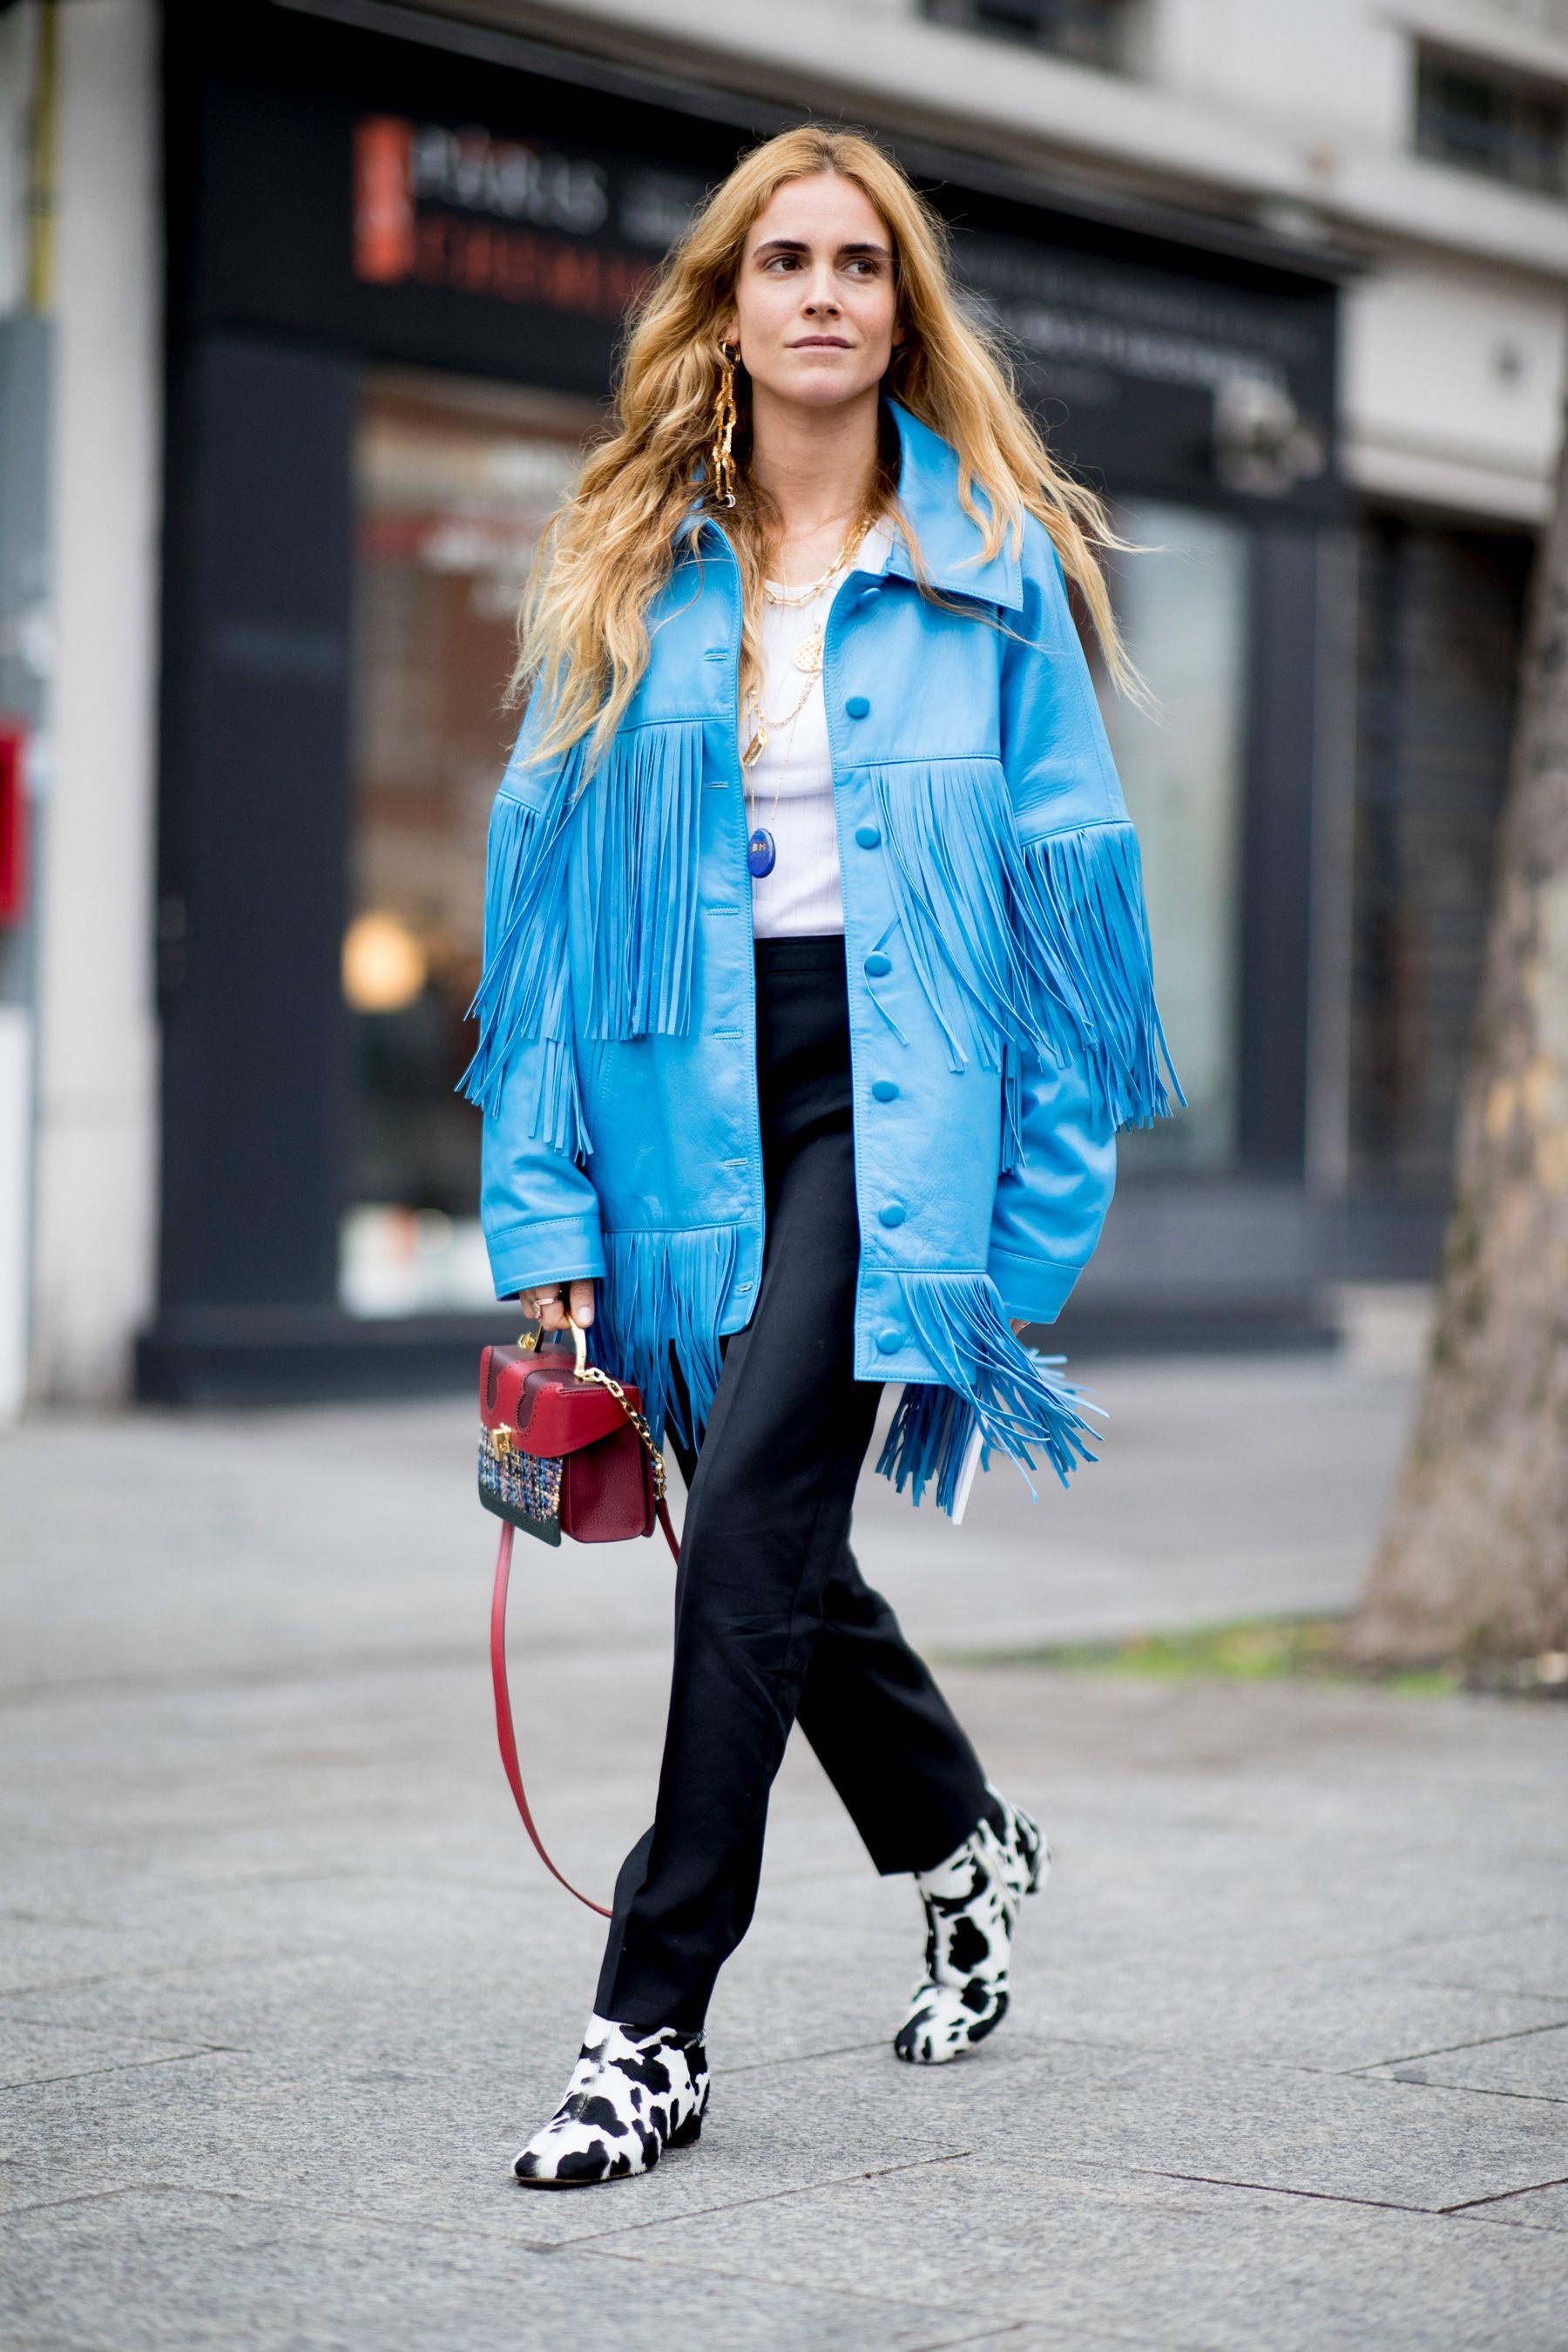 Paris Fashion Week Street Style Fall 2019 Day 4 | The Impression